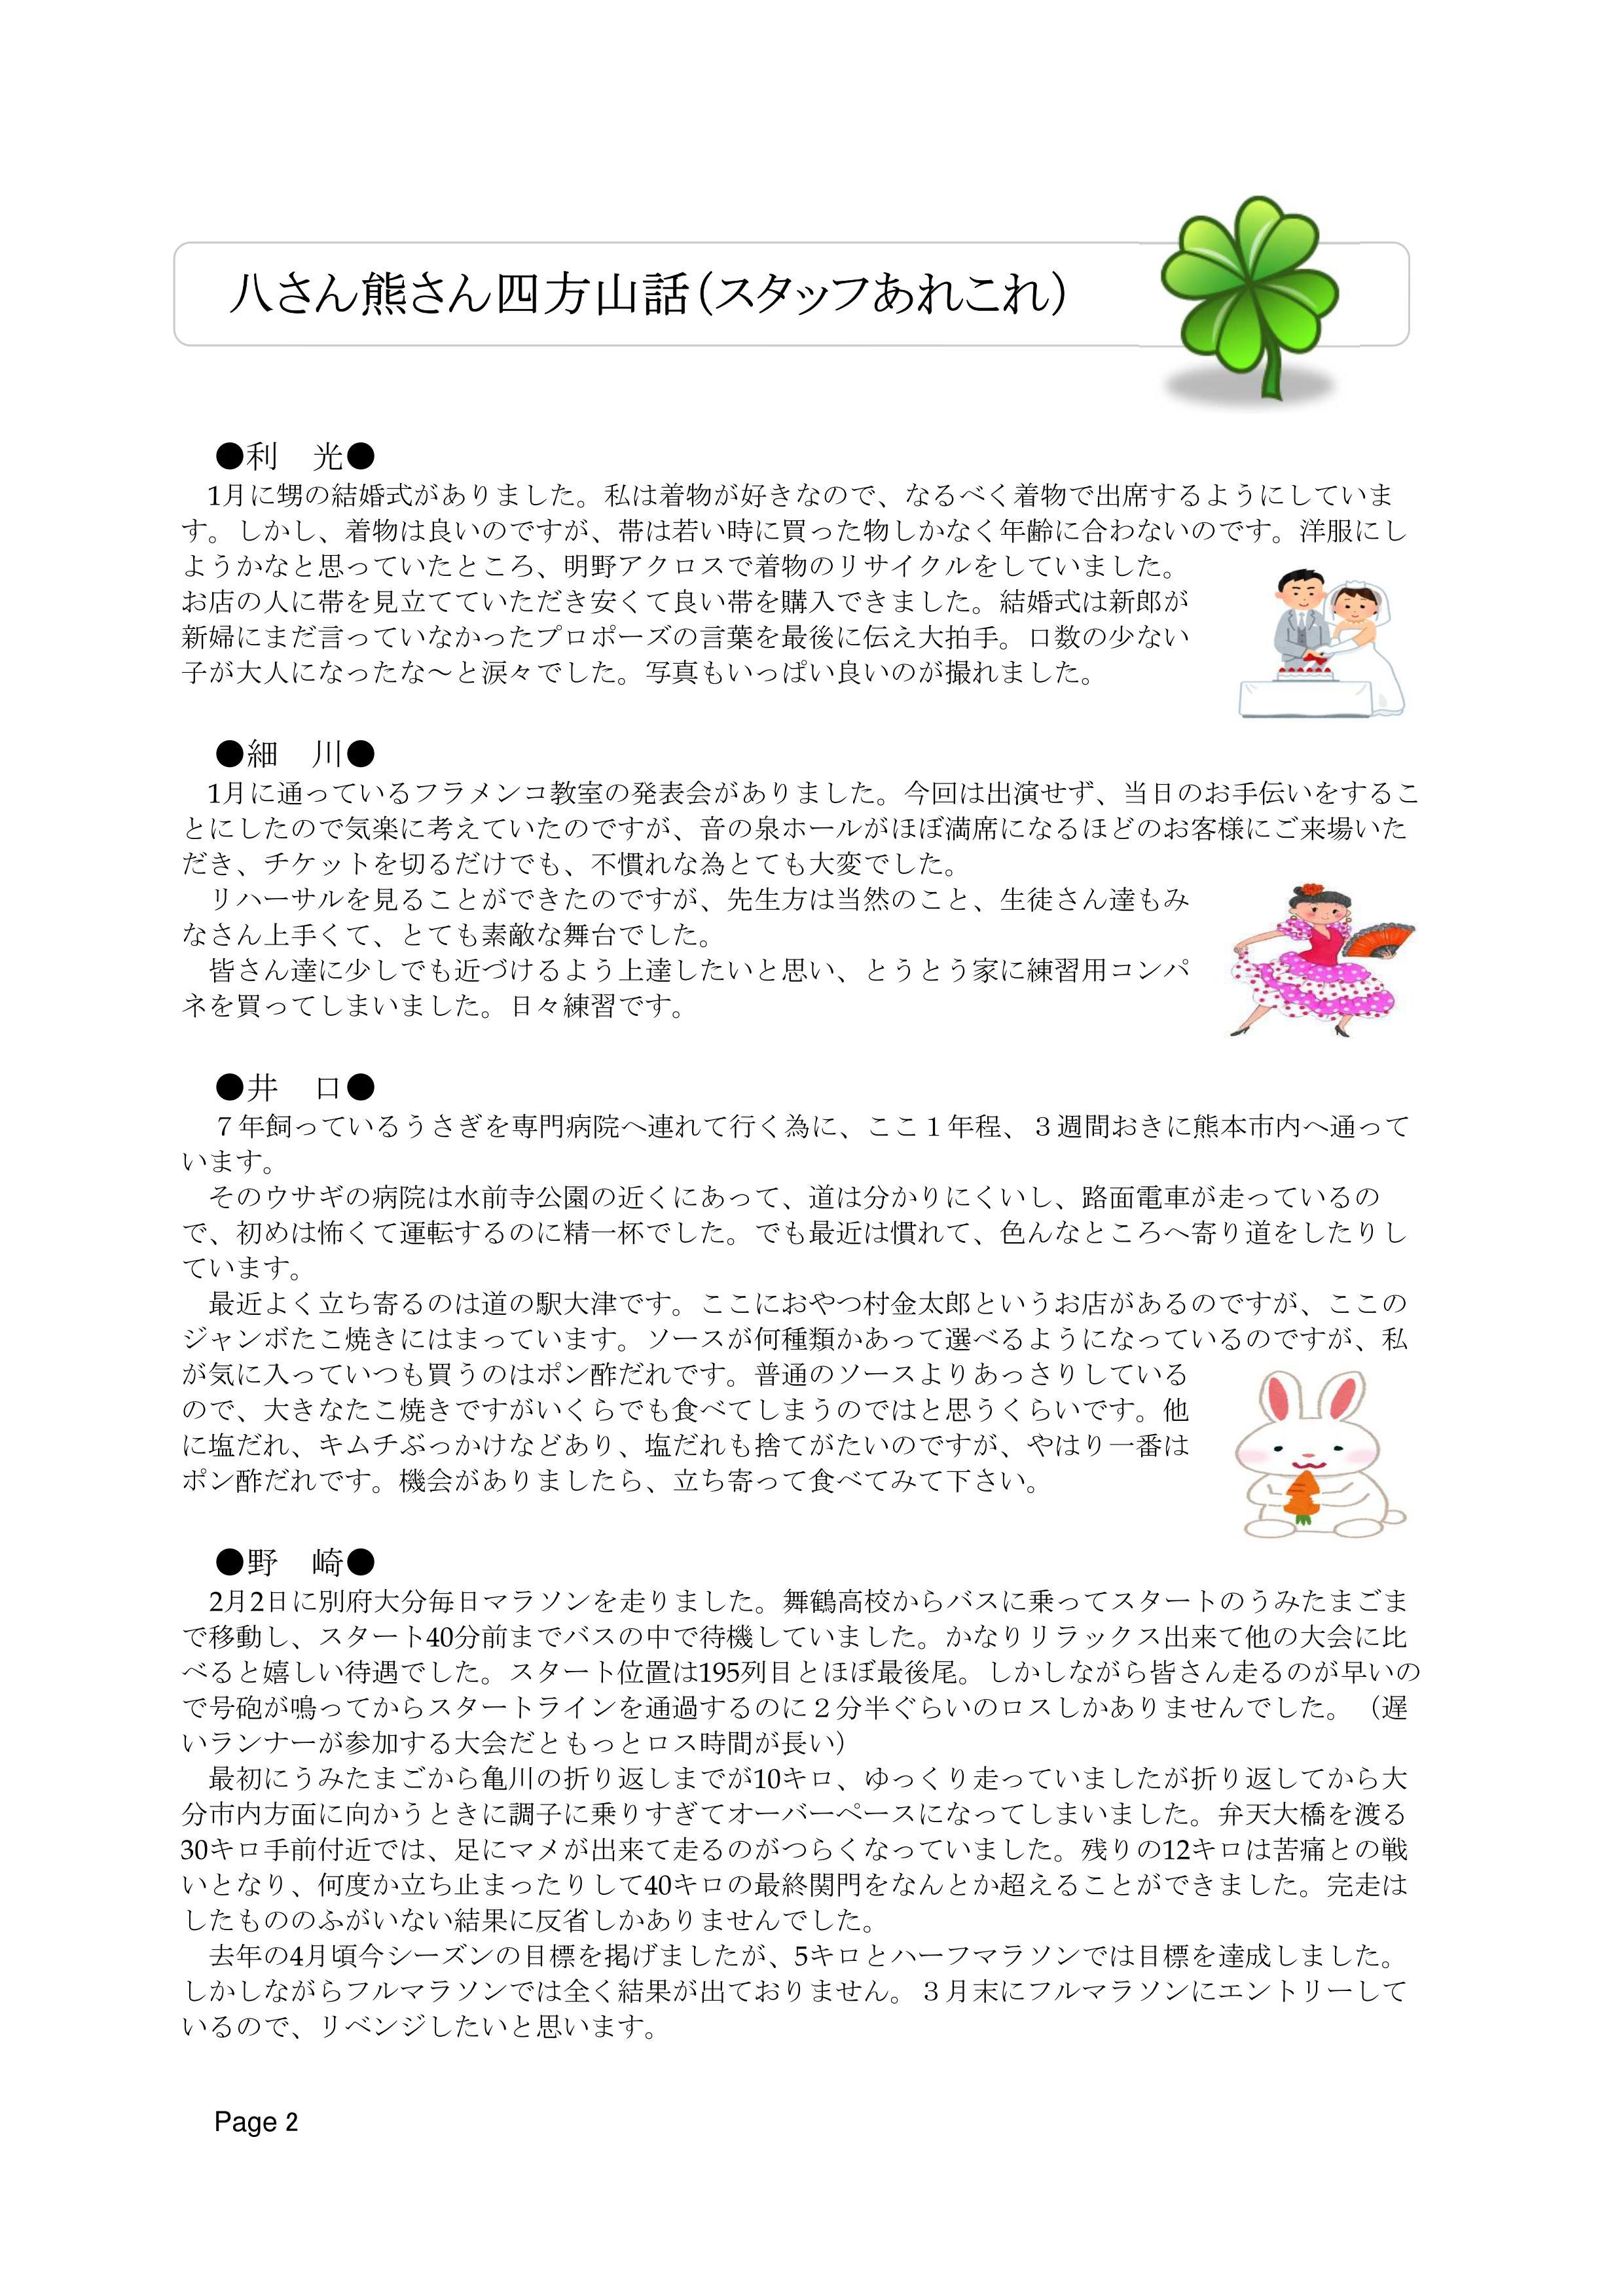 NLR2.2_02.jpg